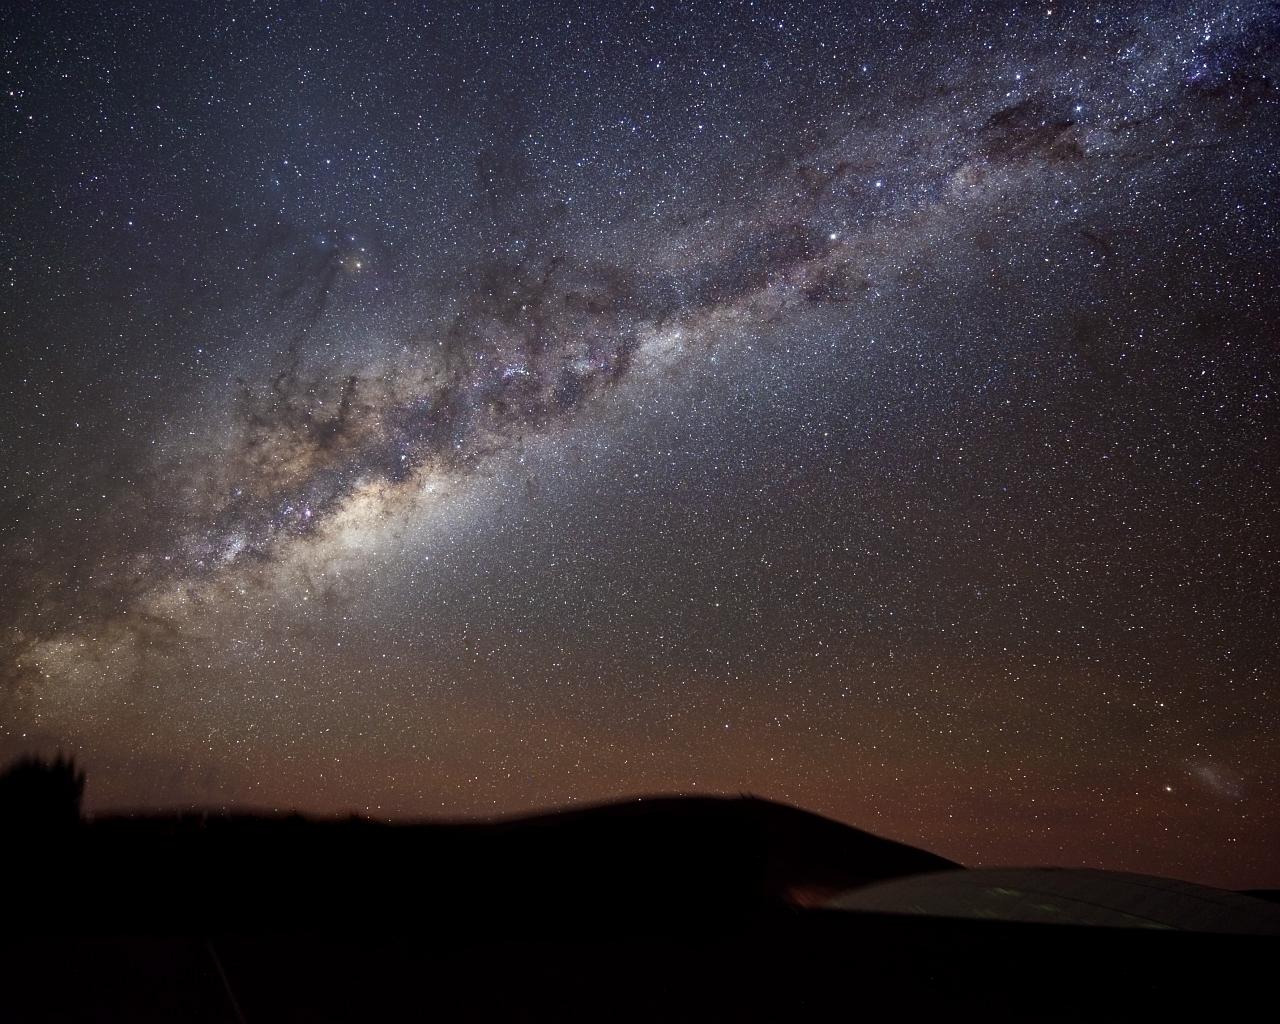 Milky Way Wallpaper Widescreen - WallpaperSafari